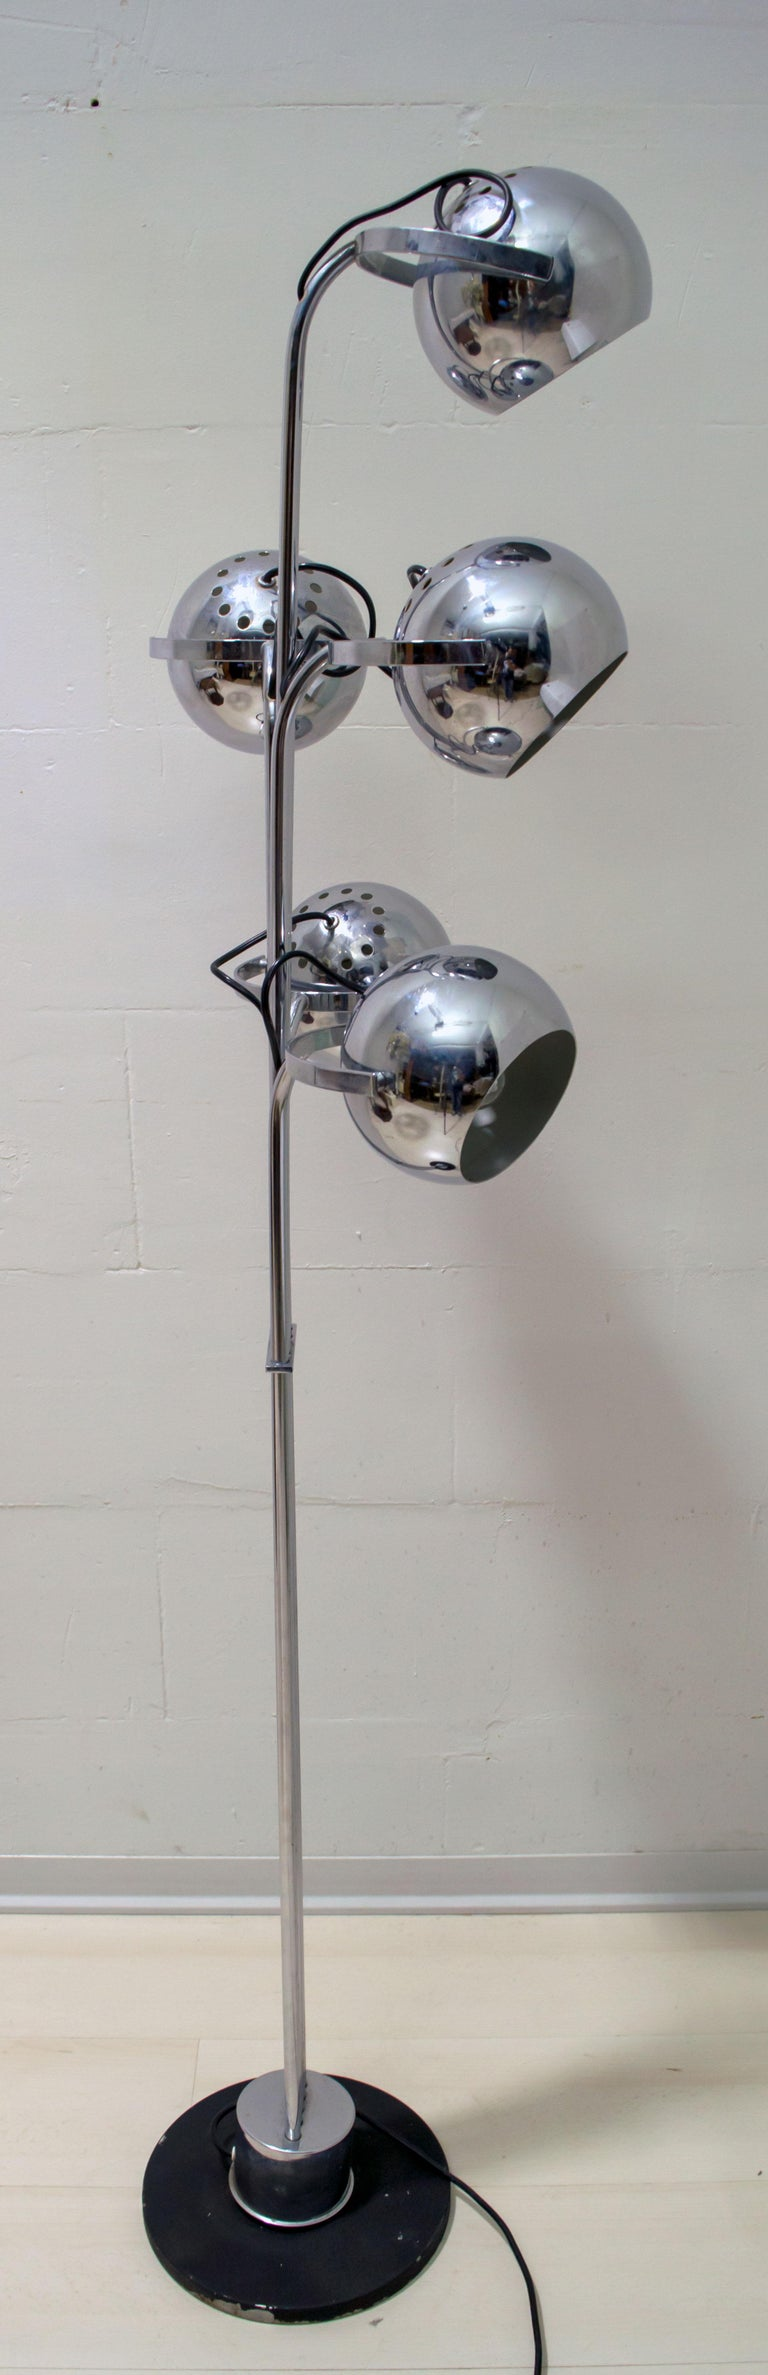 Goffredo Reggiani Mid-Century Modern Italian 5 Lights Chrome Floor Lamp, 1970s For Sale 4